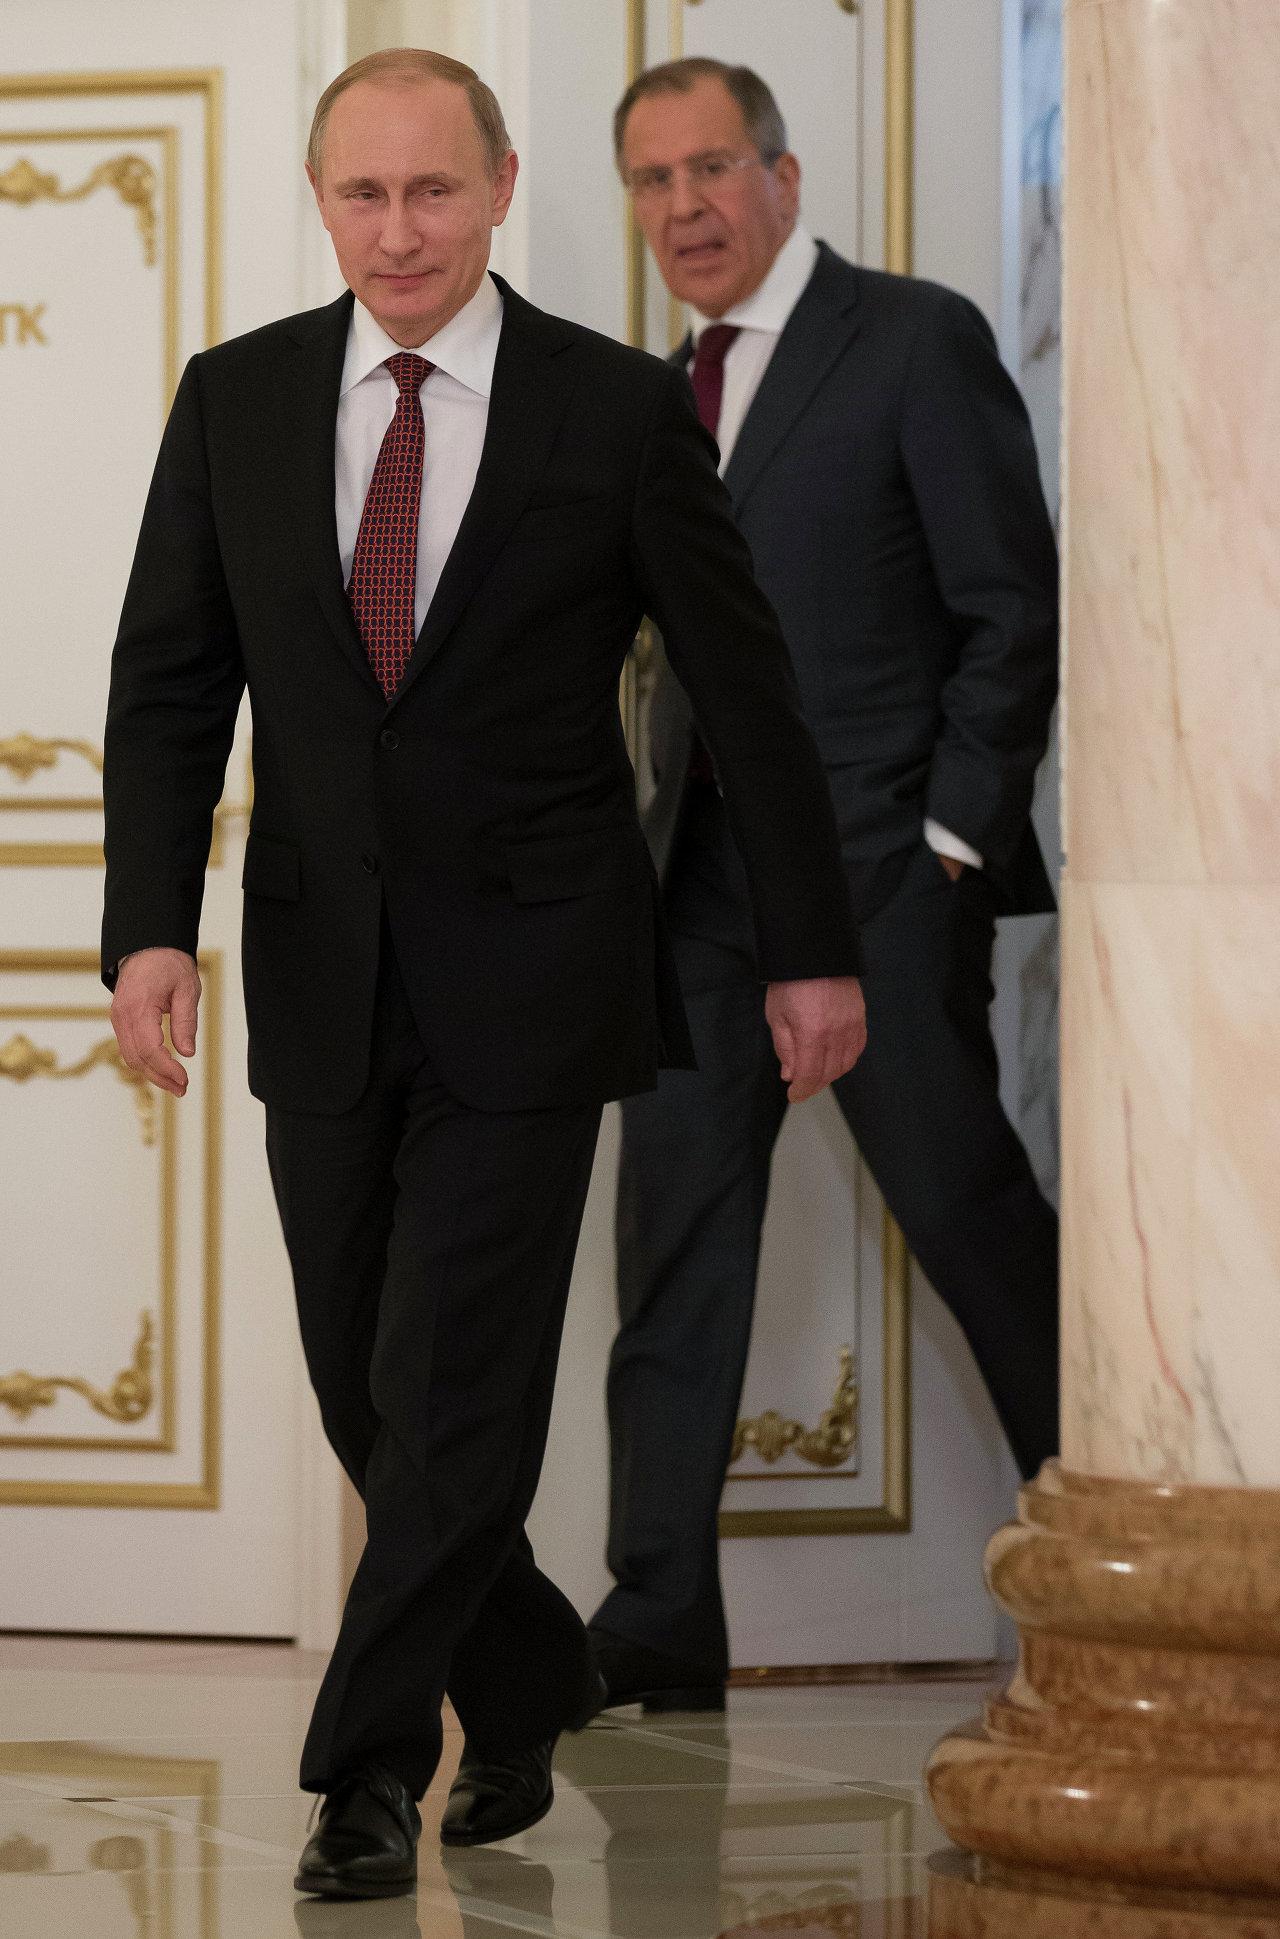 فلاديمير بوتين و سيرغي لافروف